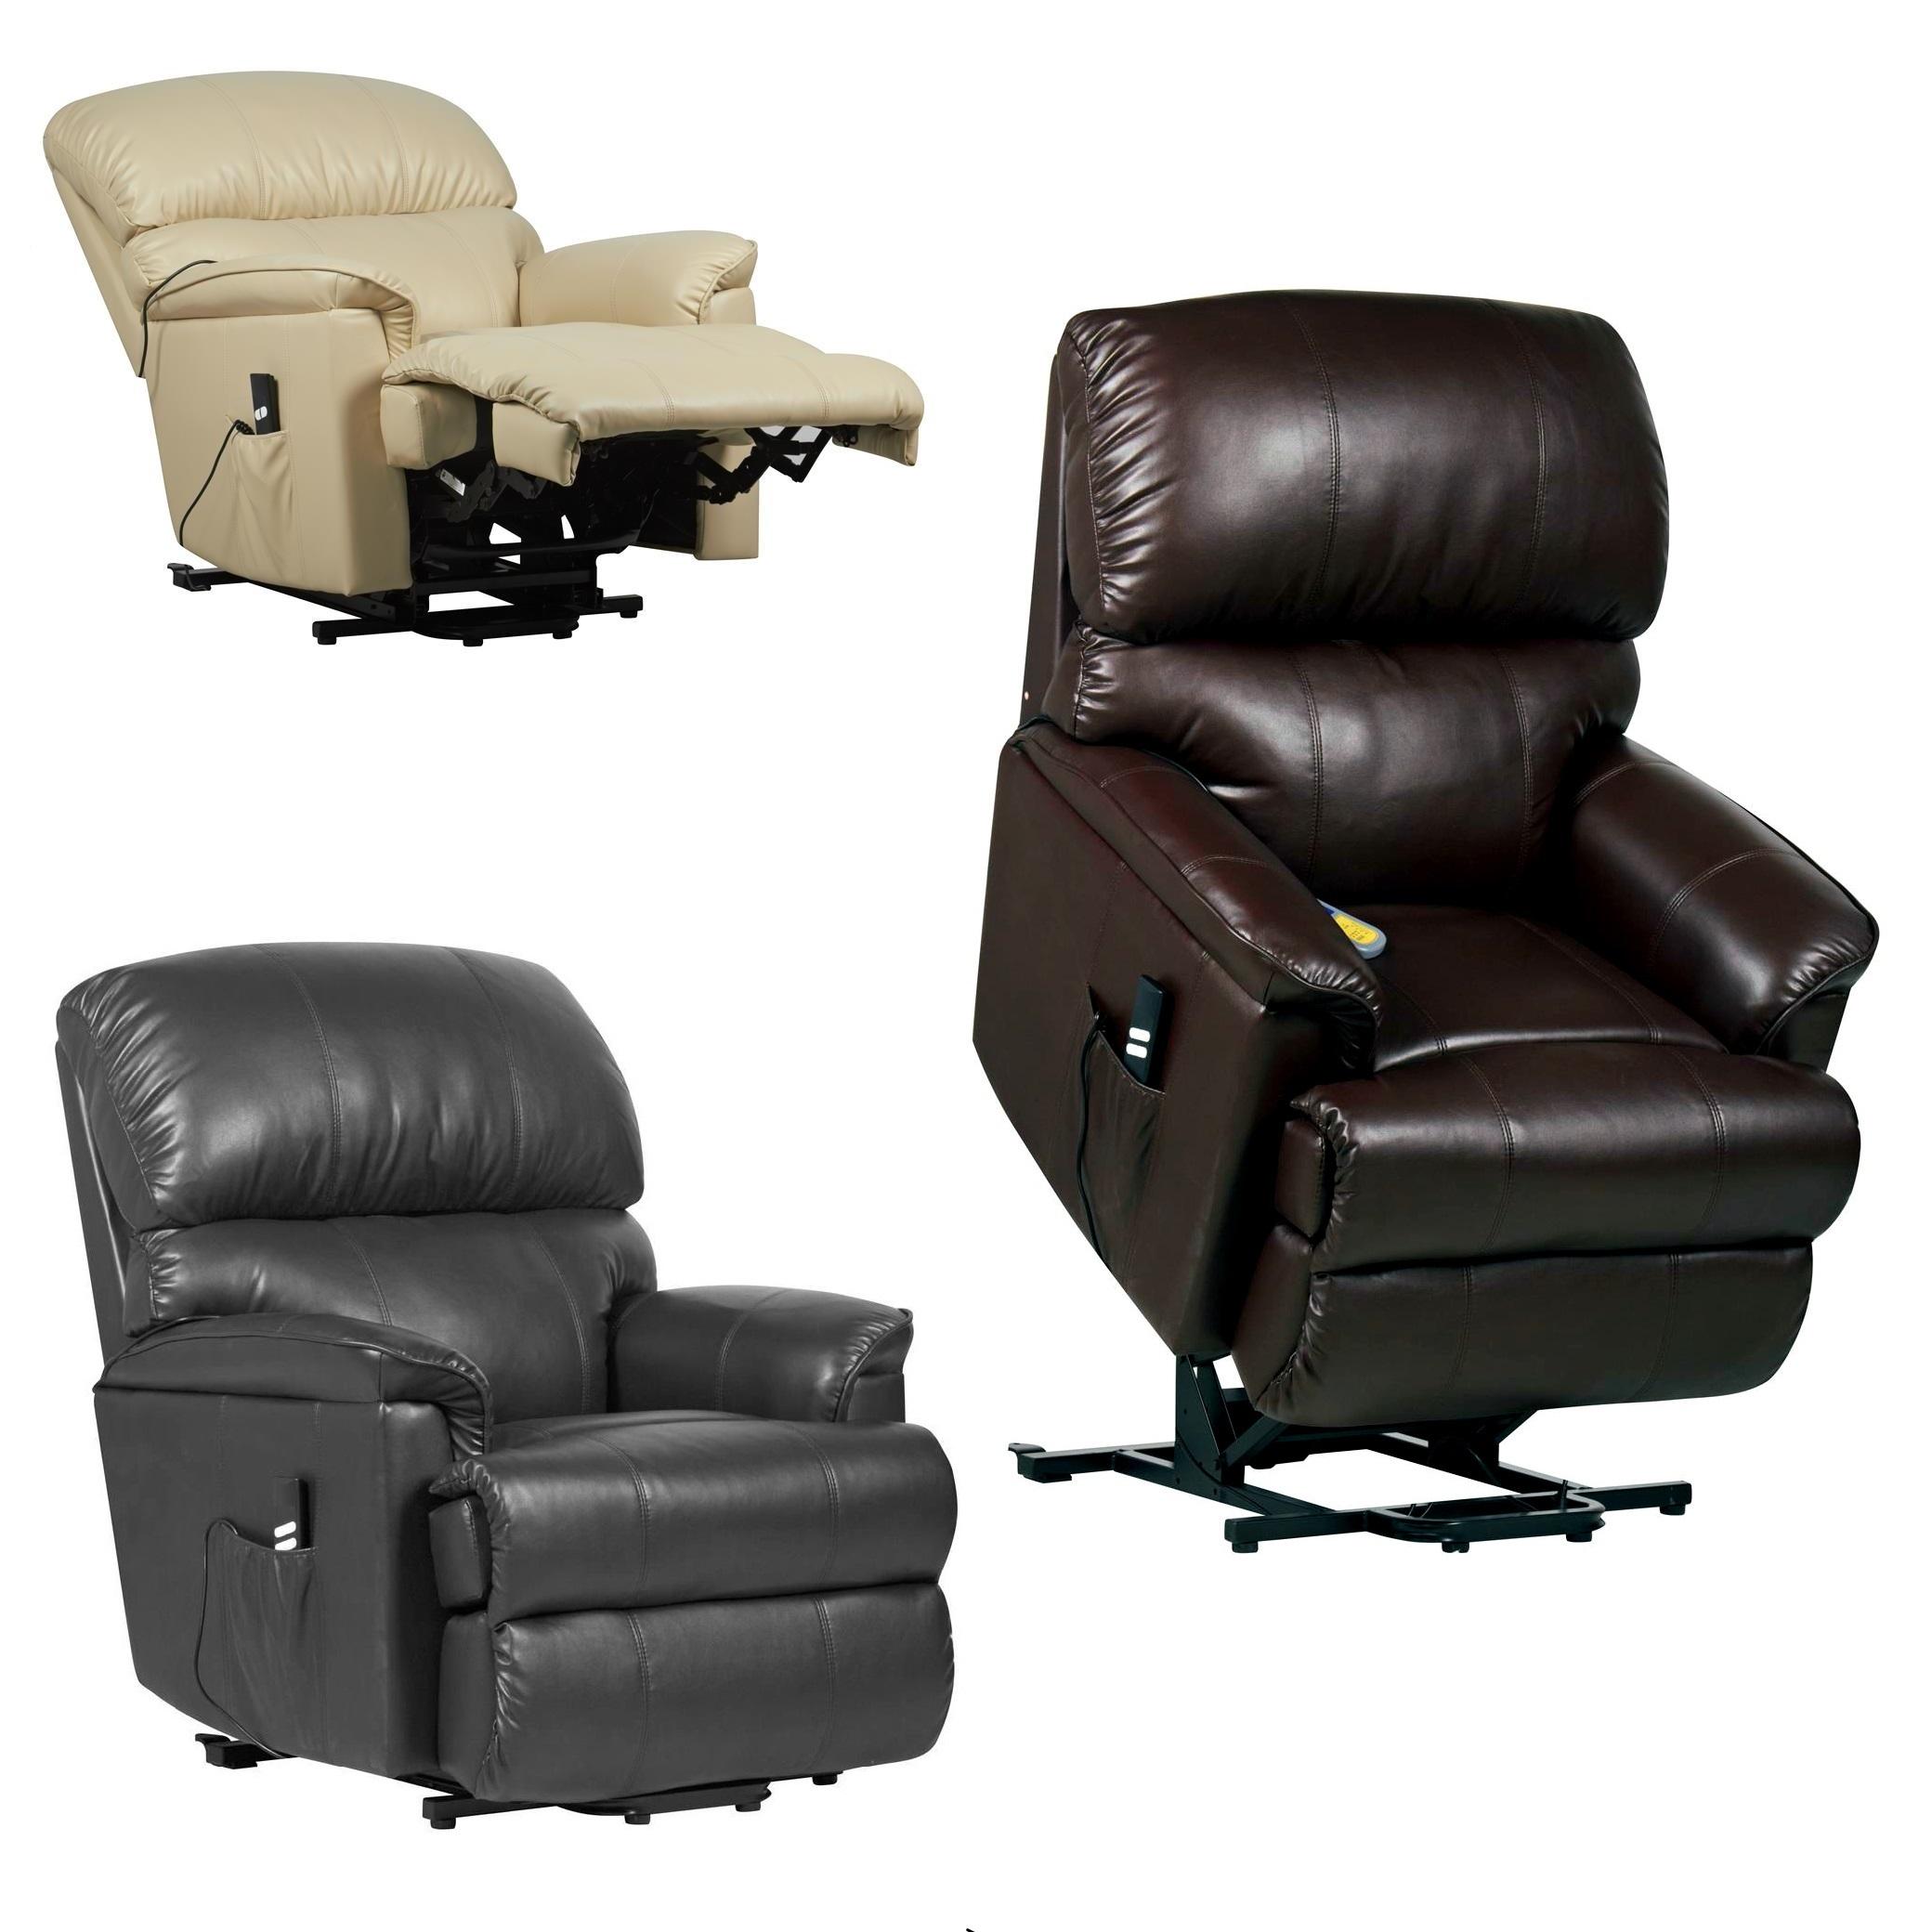 Canterbury Dual Motor Riser Recliner Chair